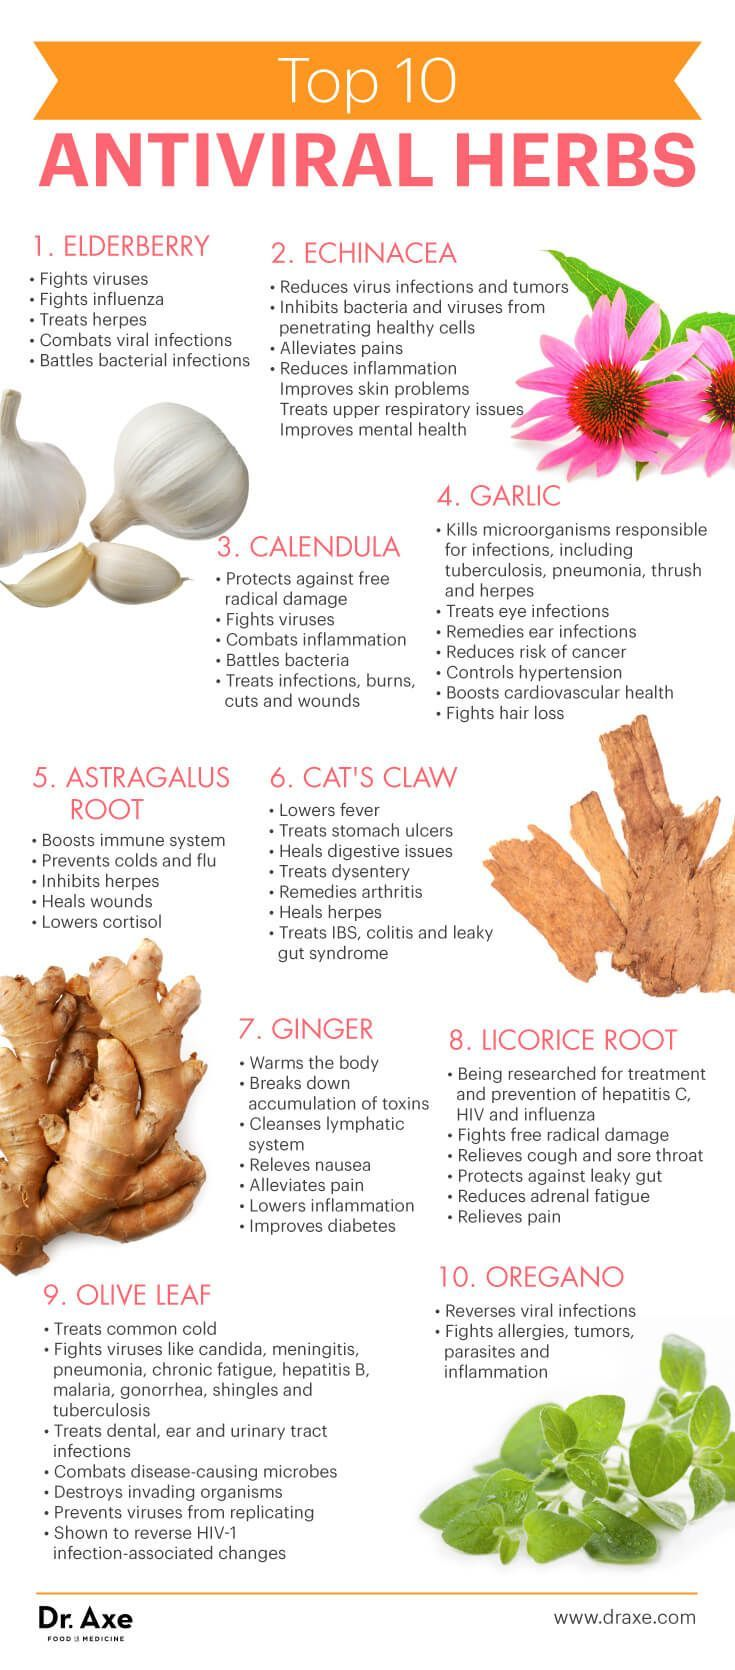 Top 10 Antiviral Herbs